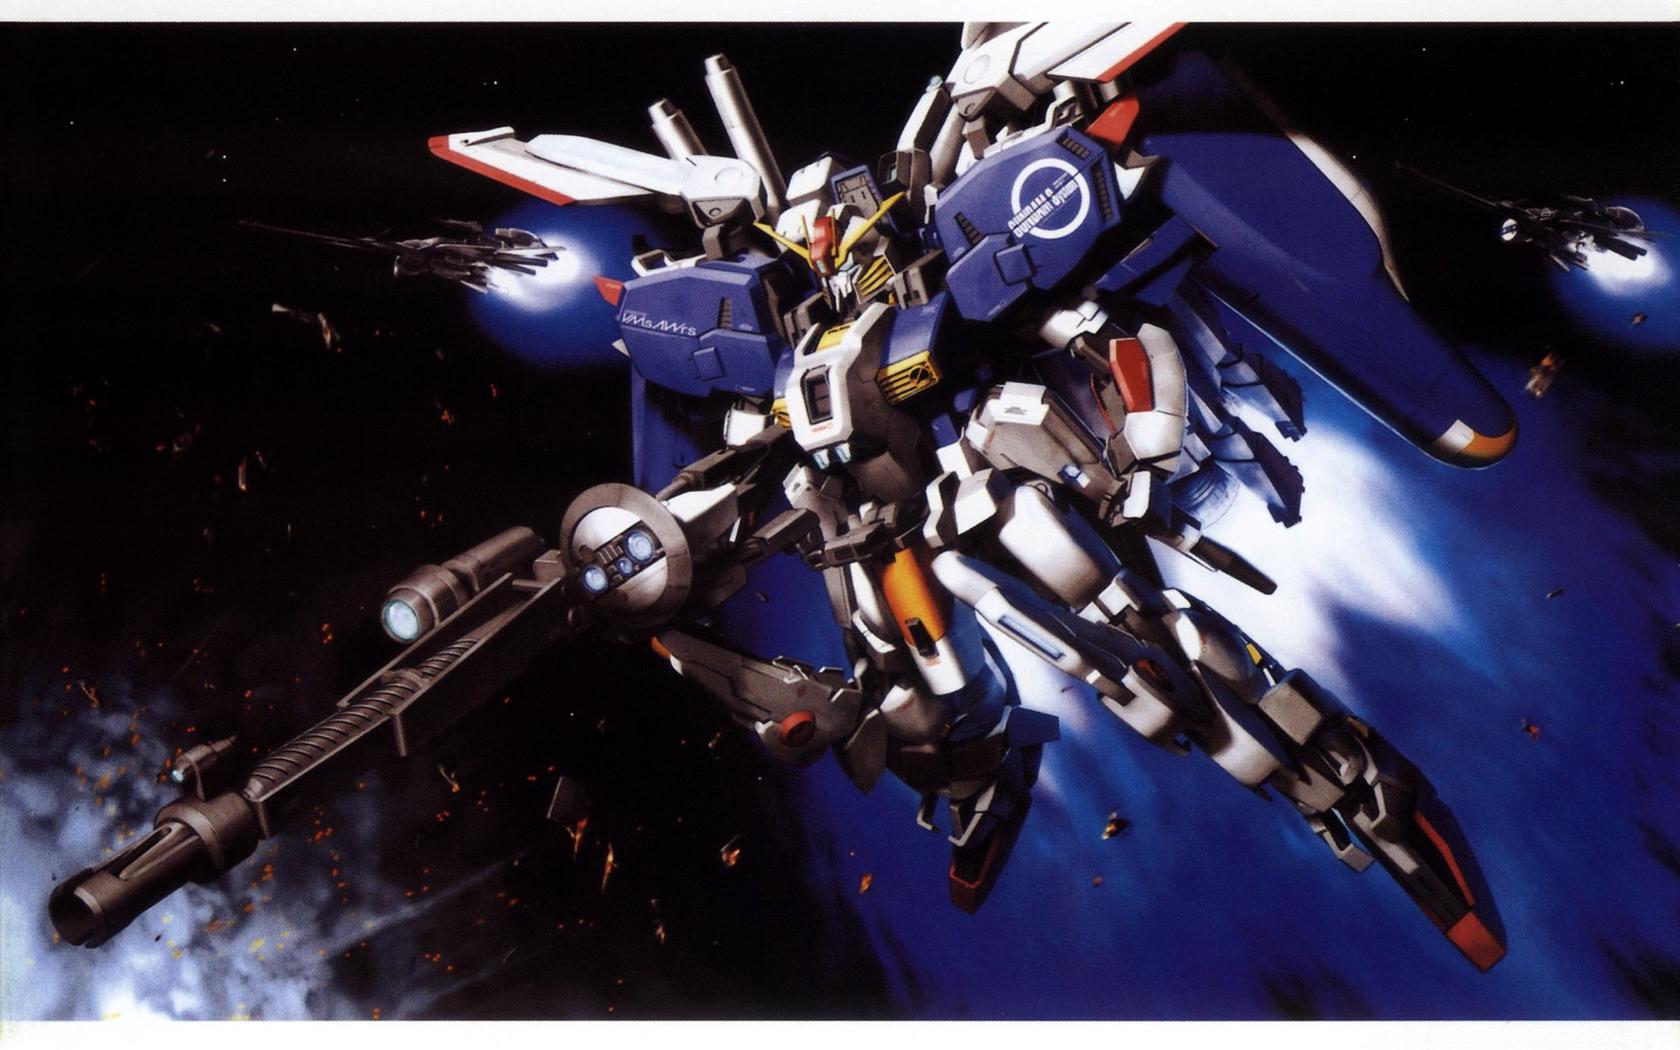 Gundam Wallpaper 1680x1050 Gundam 1680x1050